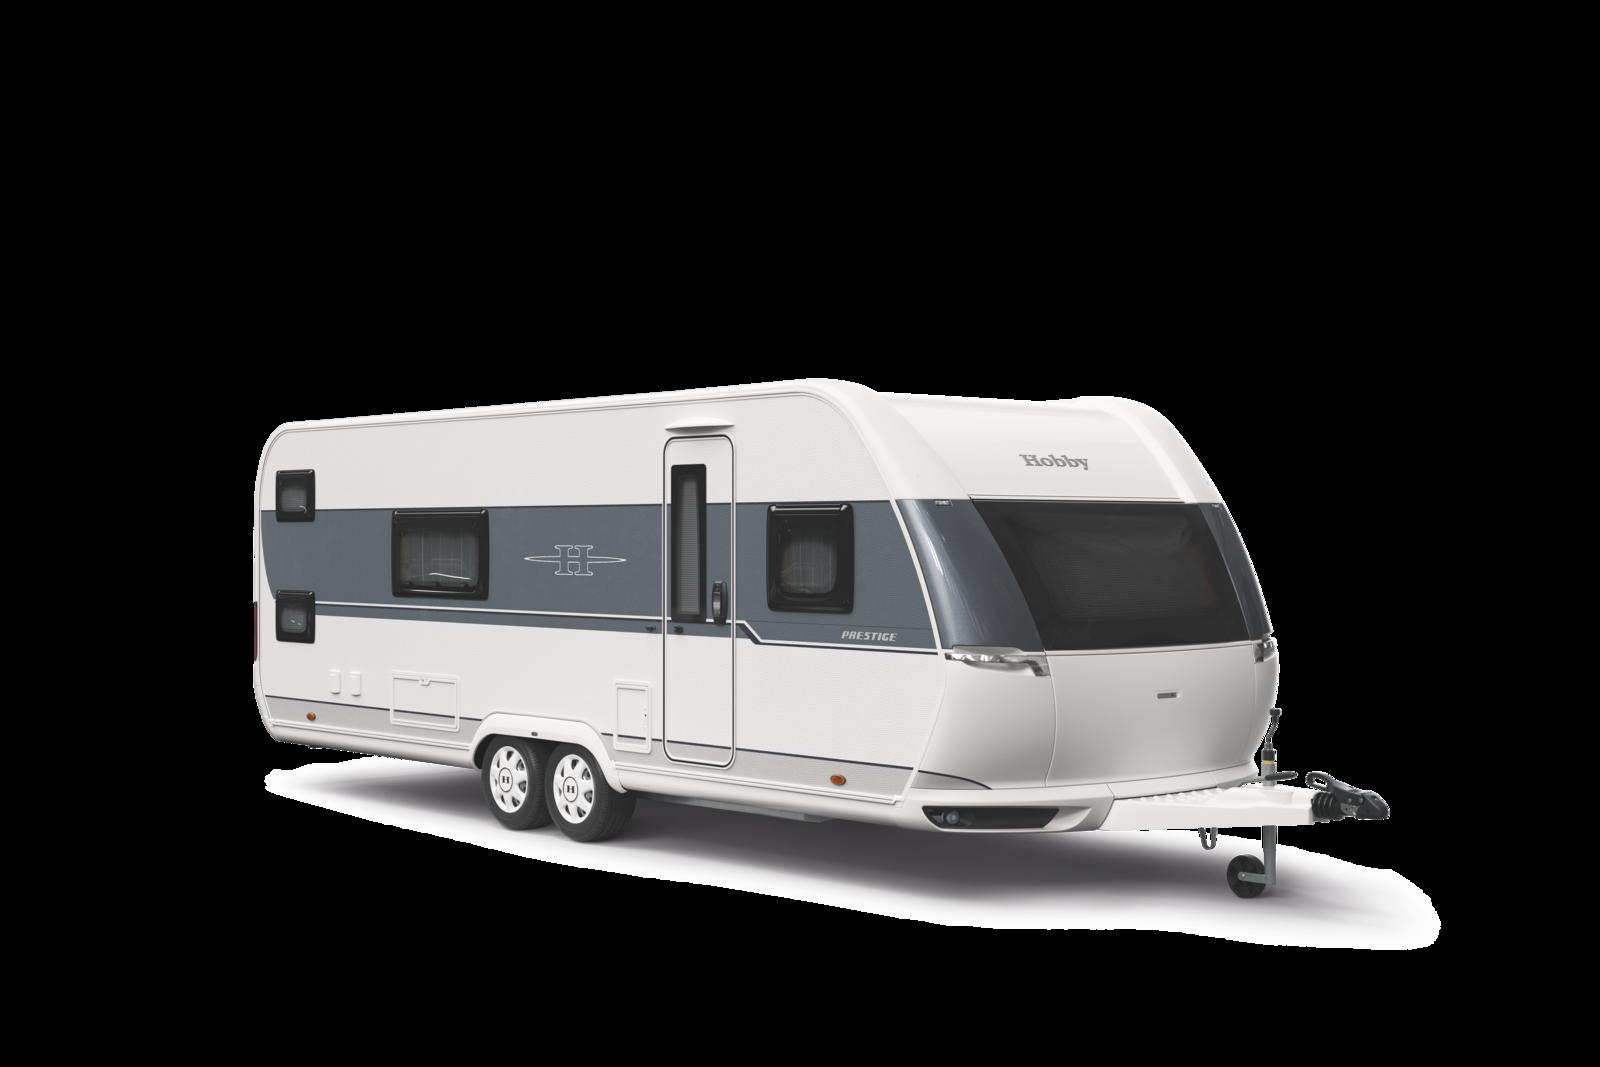 prestige hobby caravan. Black Bedroom Furniture Sets. Home Design Ideas